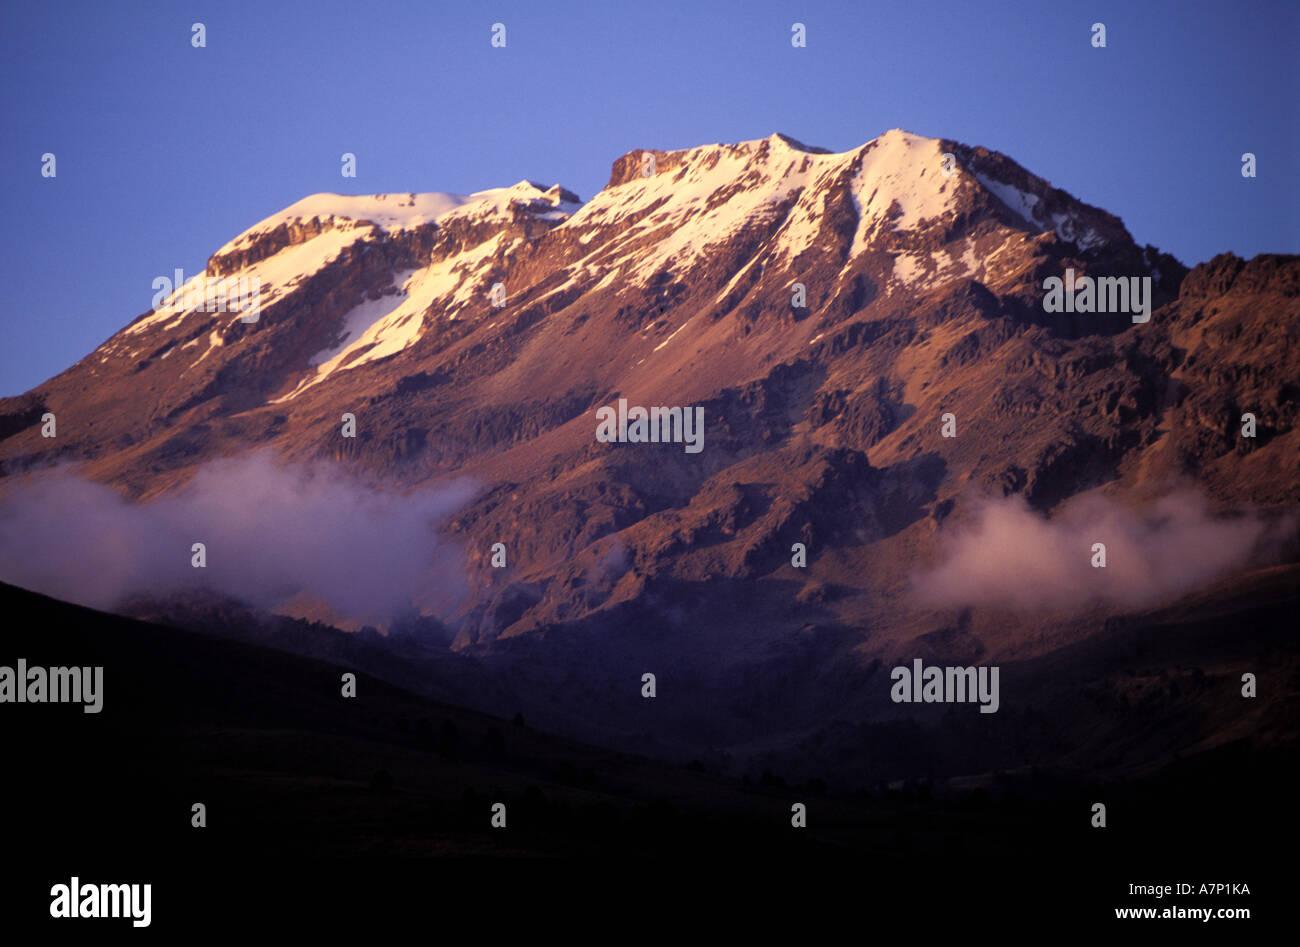 Mexico, Puebla State, Popocatepetl volcano (17, 887 ft) - Stock Image